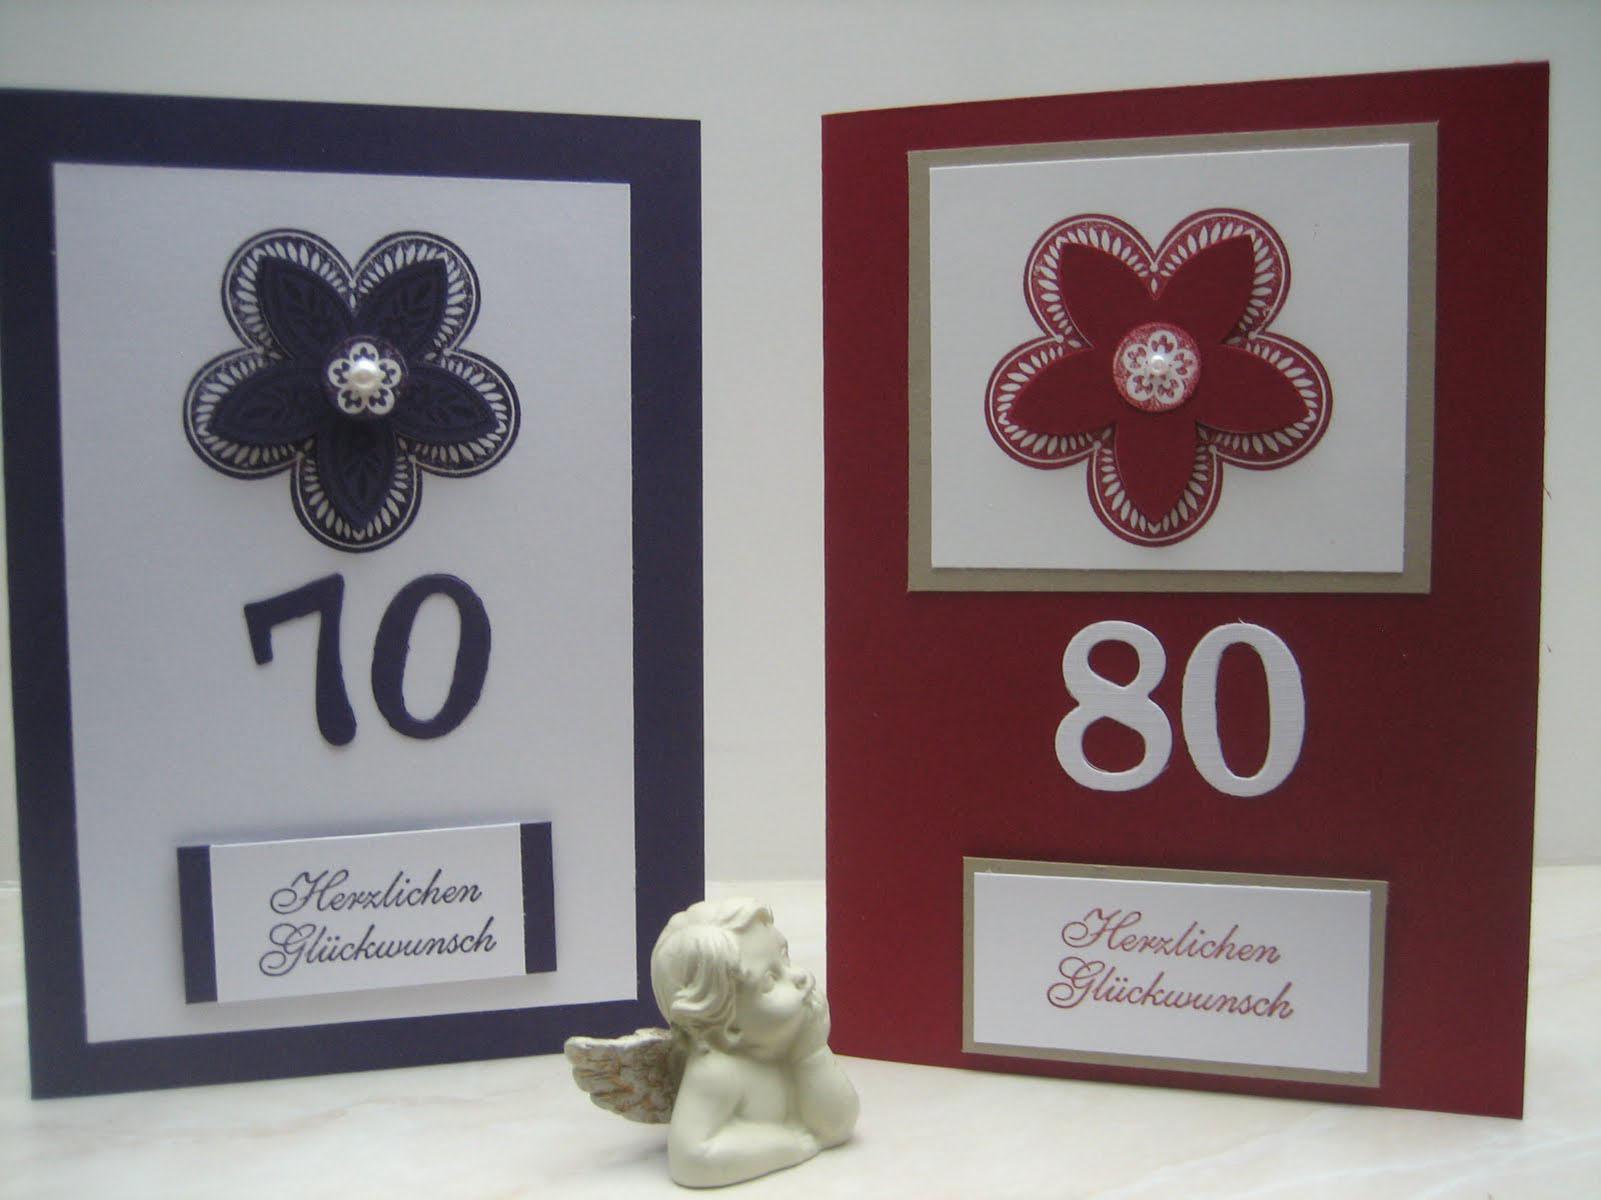 Einladung Zum 80 Geburtstag  Einladung Zum 80 Geburtstag